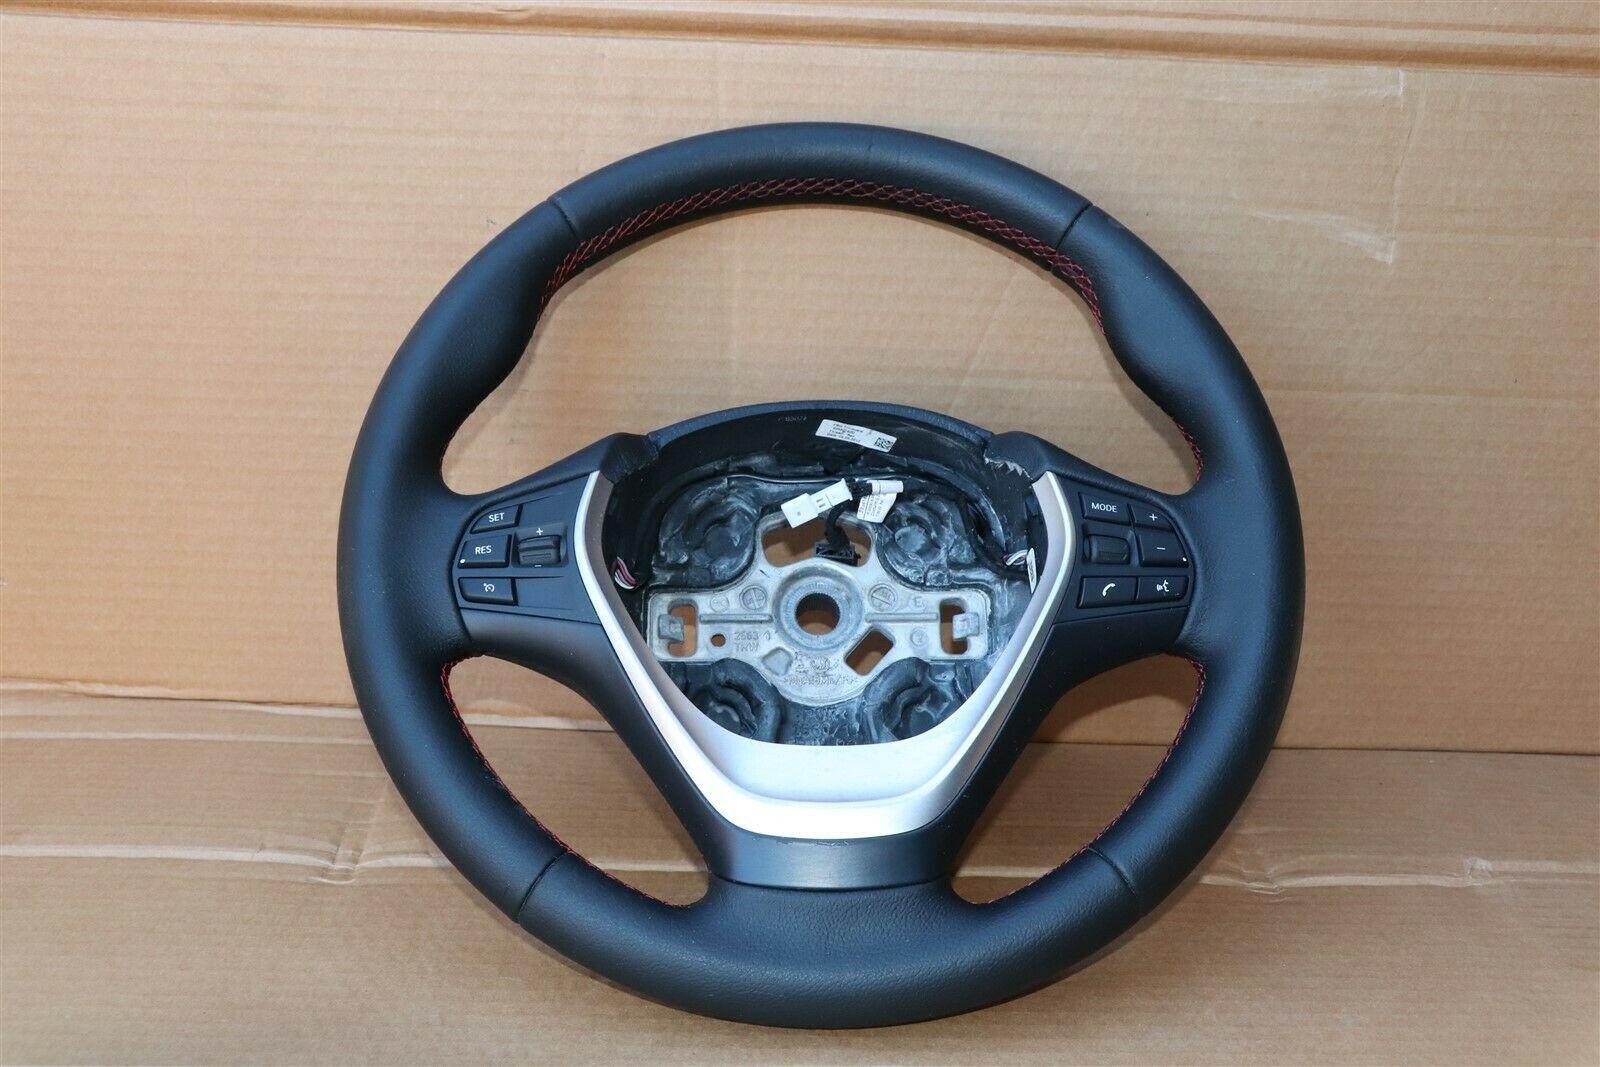 12-18 BMW F30 Sport Steering Wheel w/ Cruise BT Volume W/O Paddles -RED STITCH